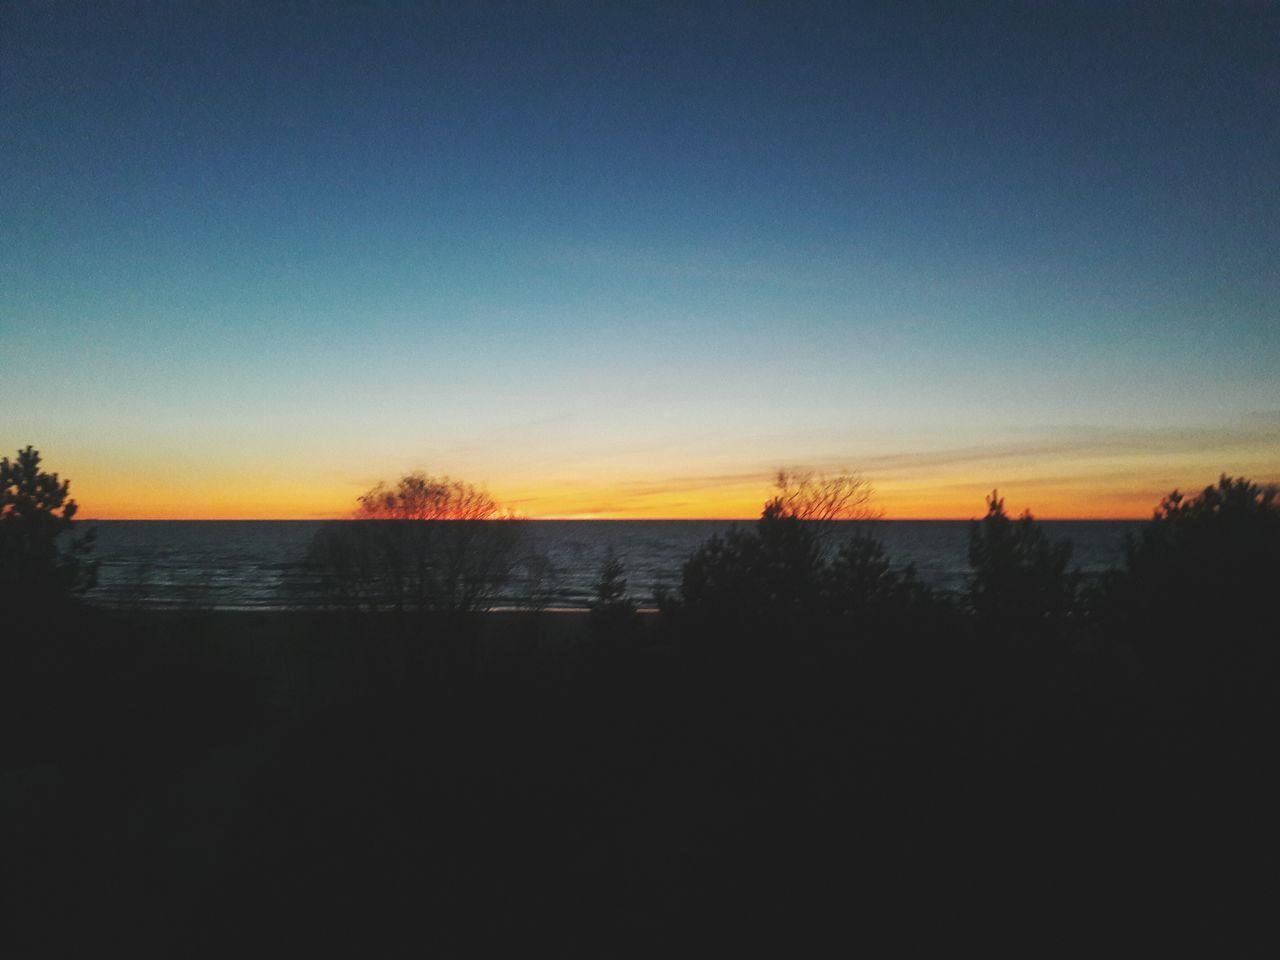 Goodnight guys, sleep well 😘 Sunset Nature Sea Sky Photography Beauty In Nature Beach No People Water